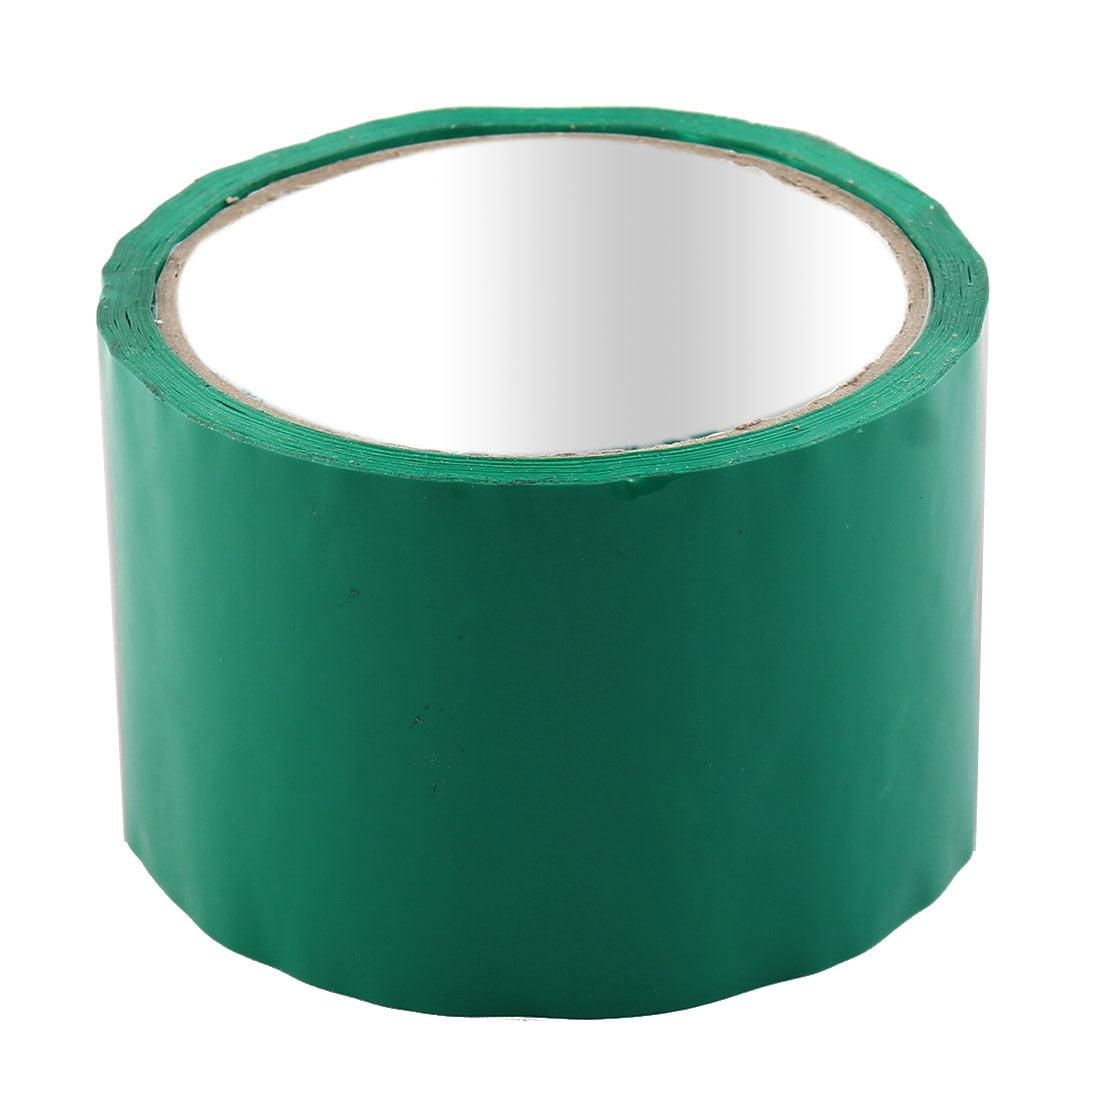 Shipping PVC Box Sealing Adhesive Tape Dark Green 2.4'' x 32.8 Yards(98.4 Ft)